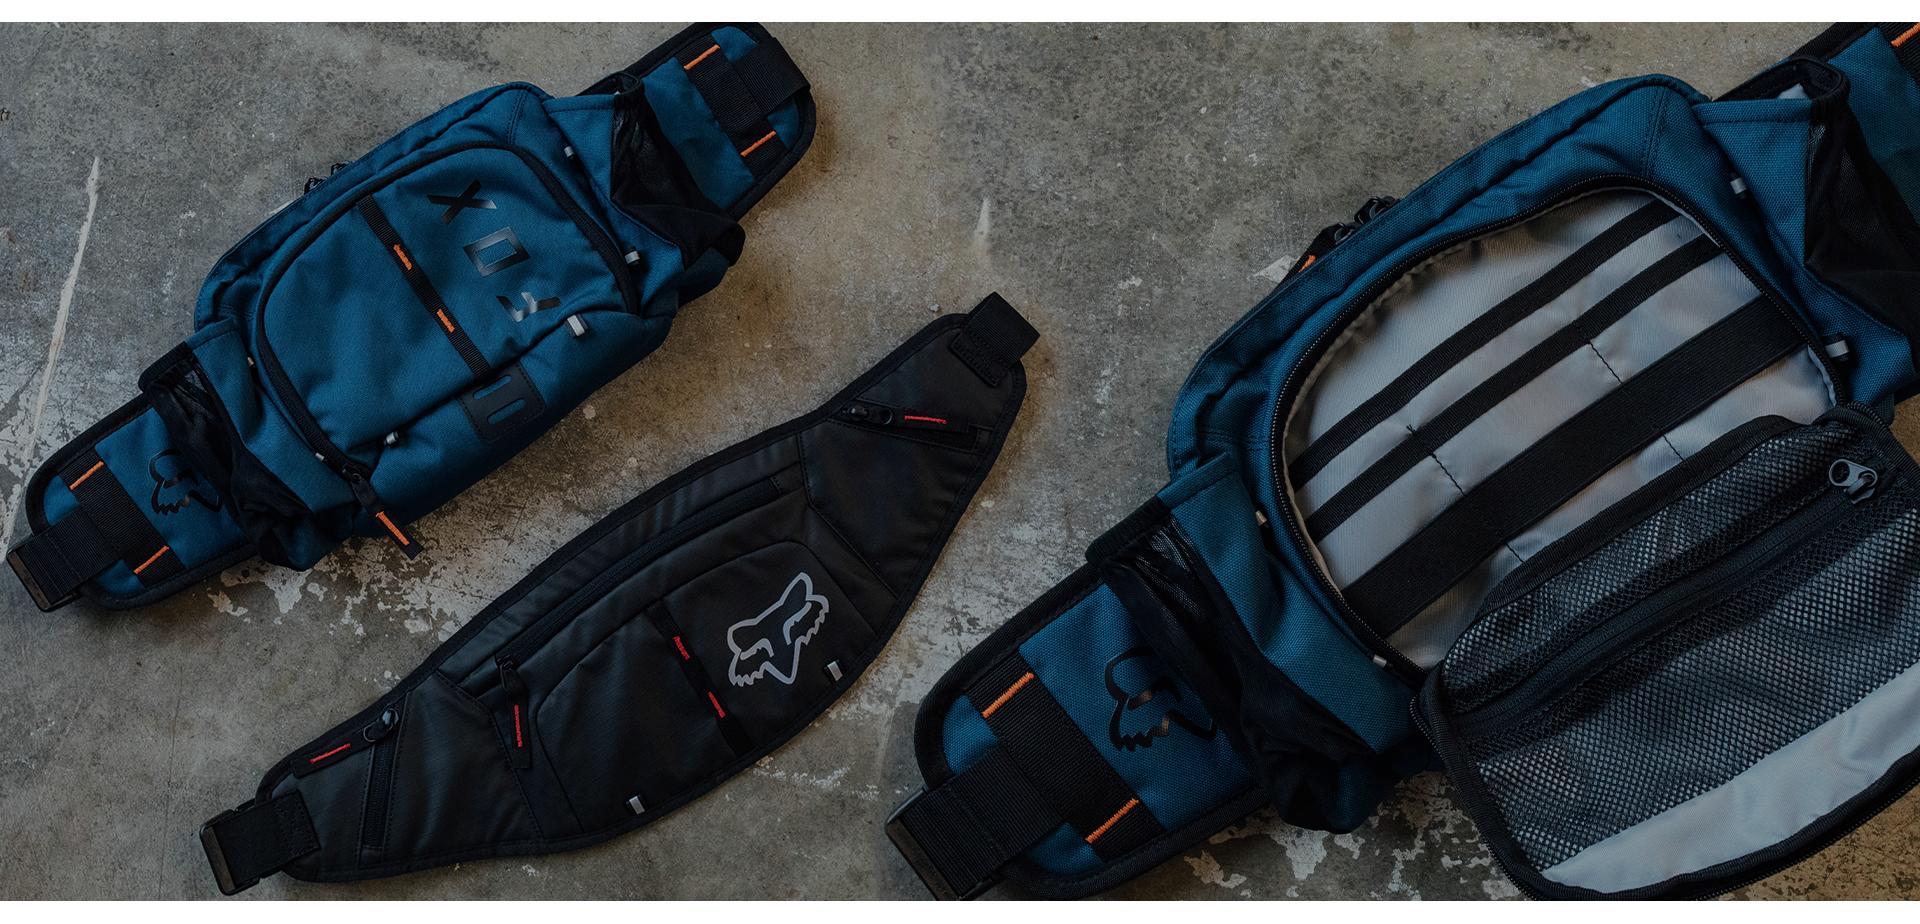 Fox Head hip packs for mountain biking on display